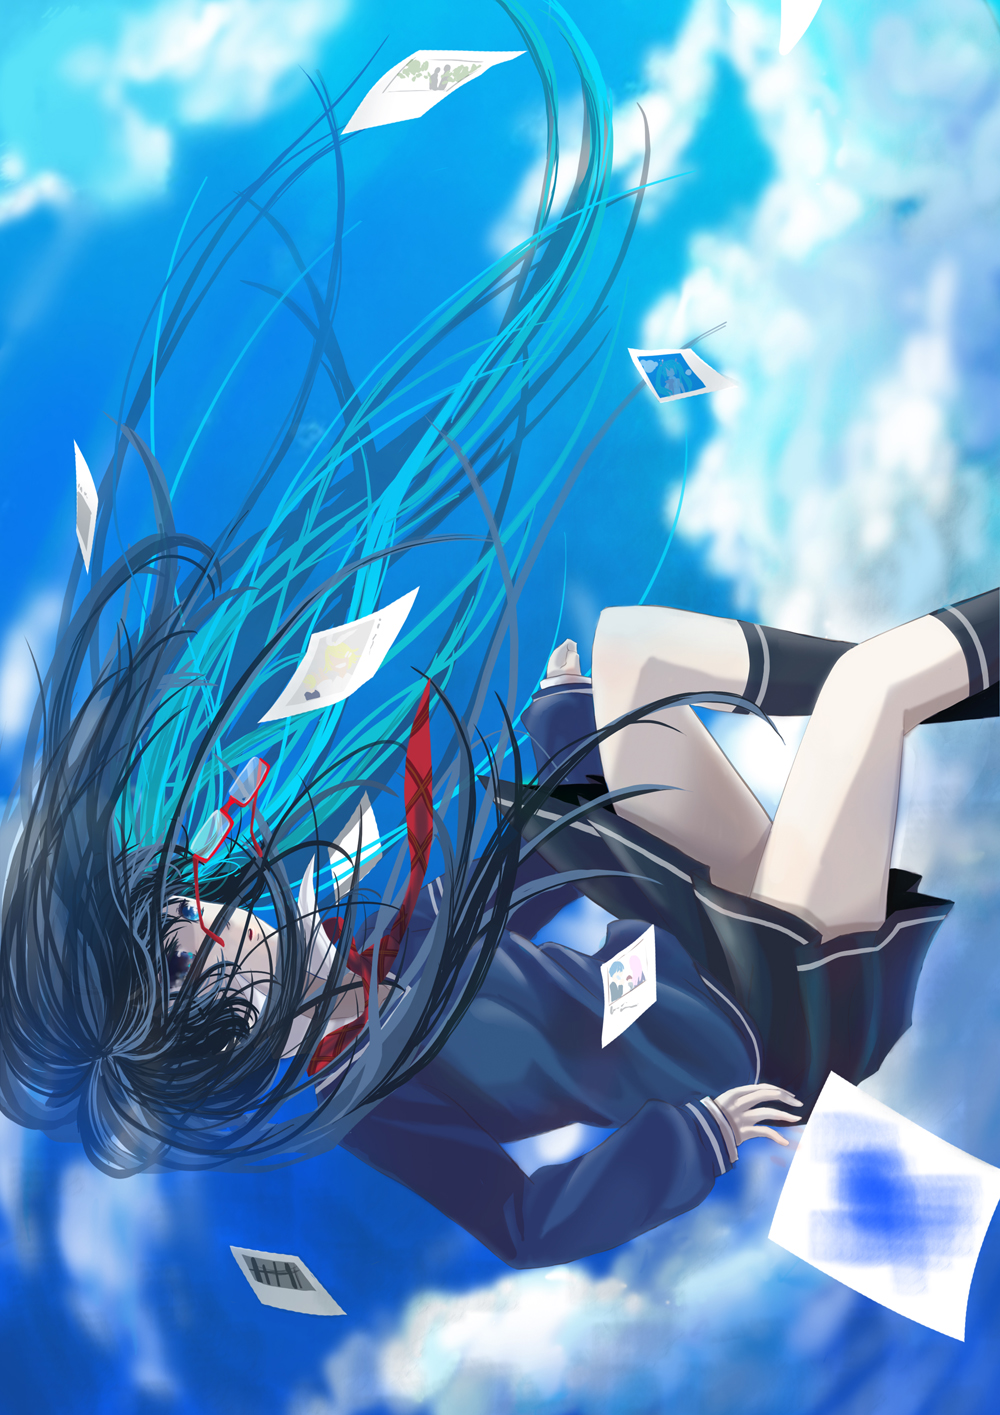 Monochrome Blue Sky Vocaloid Mobile Wallpaper 783015 Zerochan